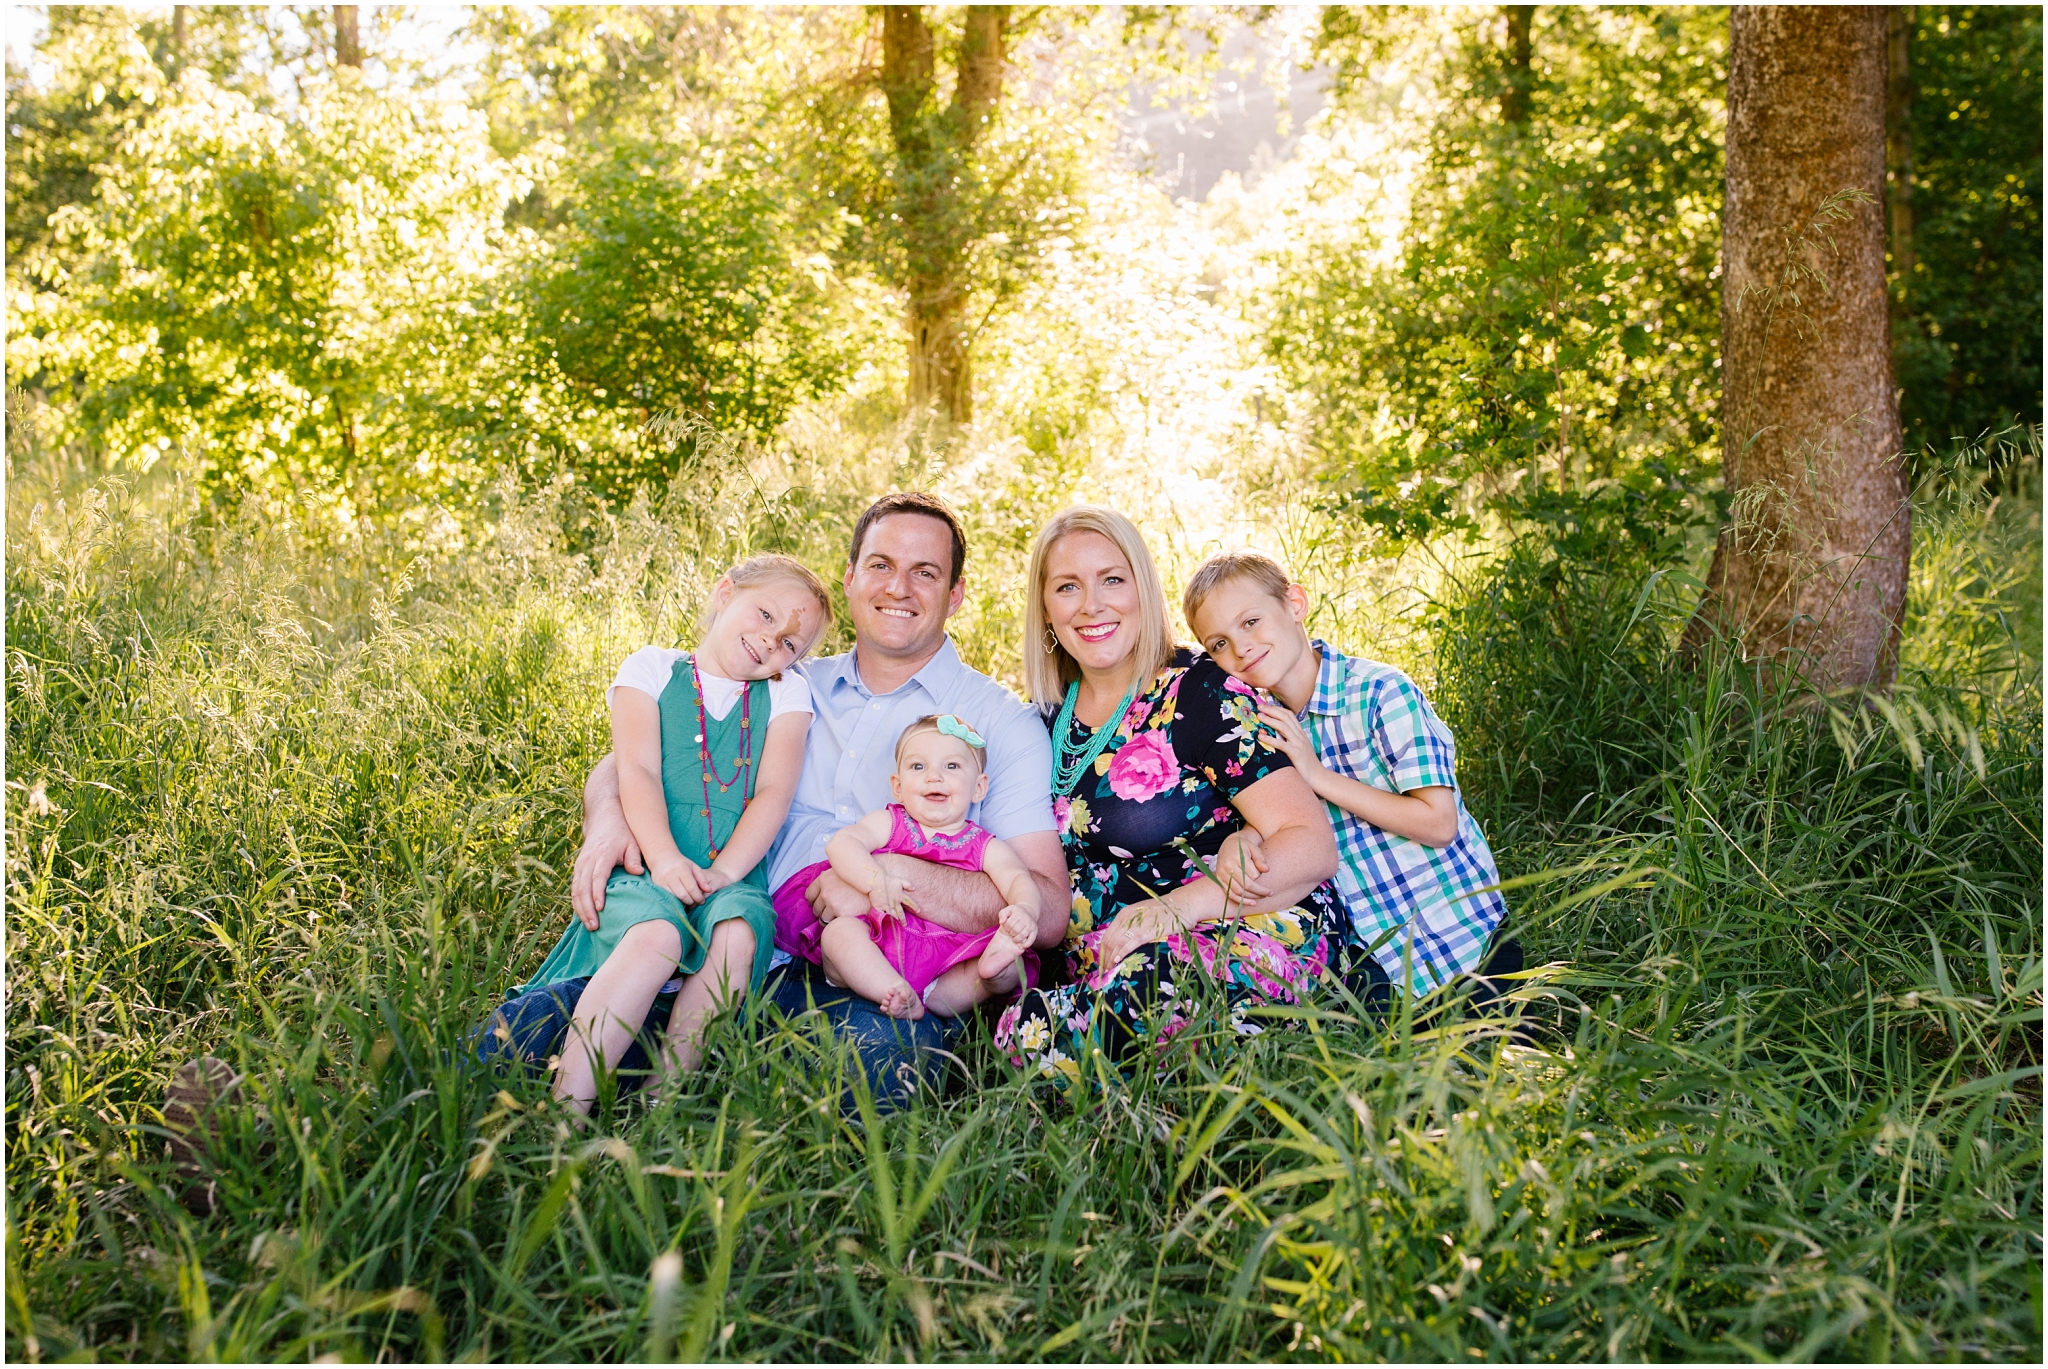 Lizzie-B-Imagery-Utah-Family-Photographer-Utah-County-Photographer-Hobble-Creek-Canyon_0005.jpg